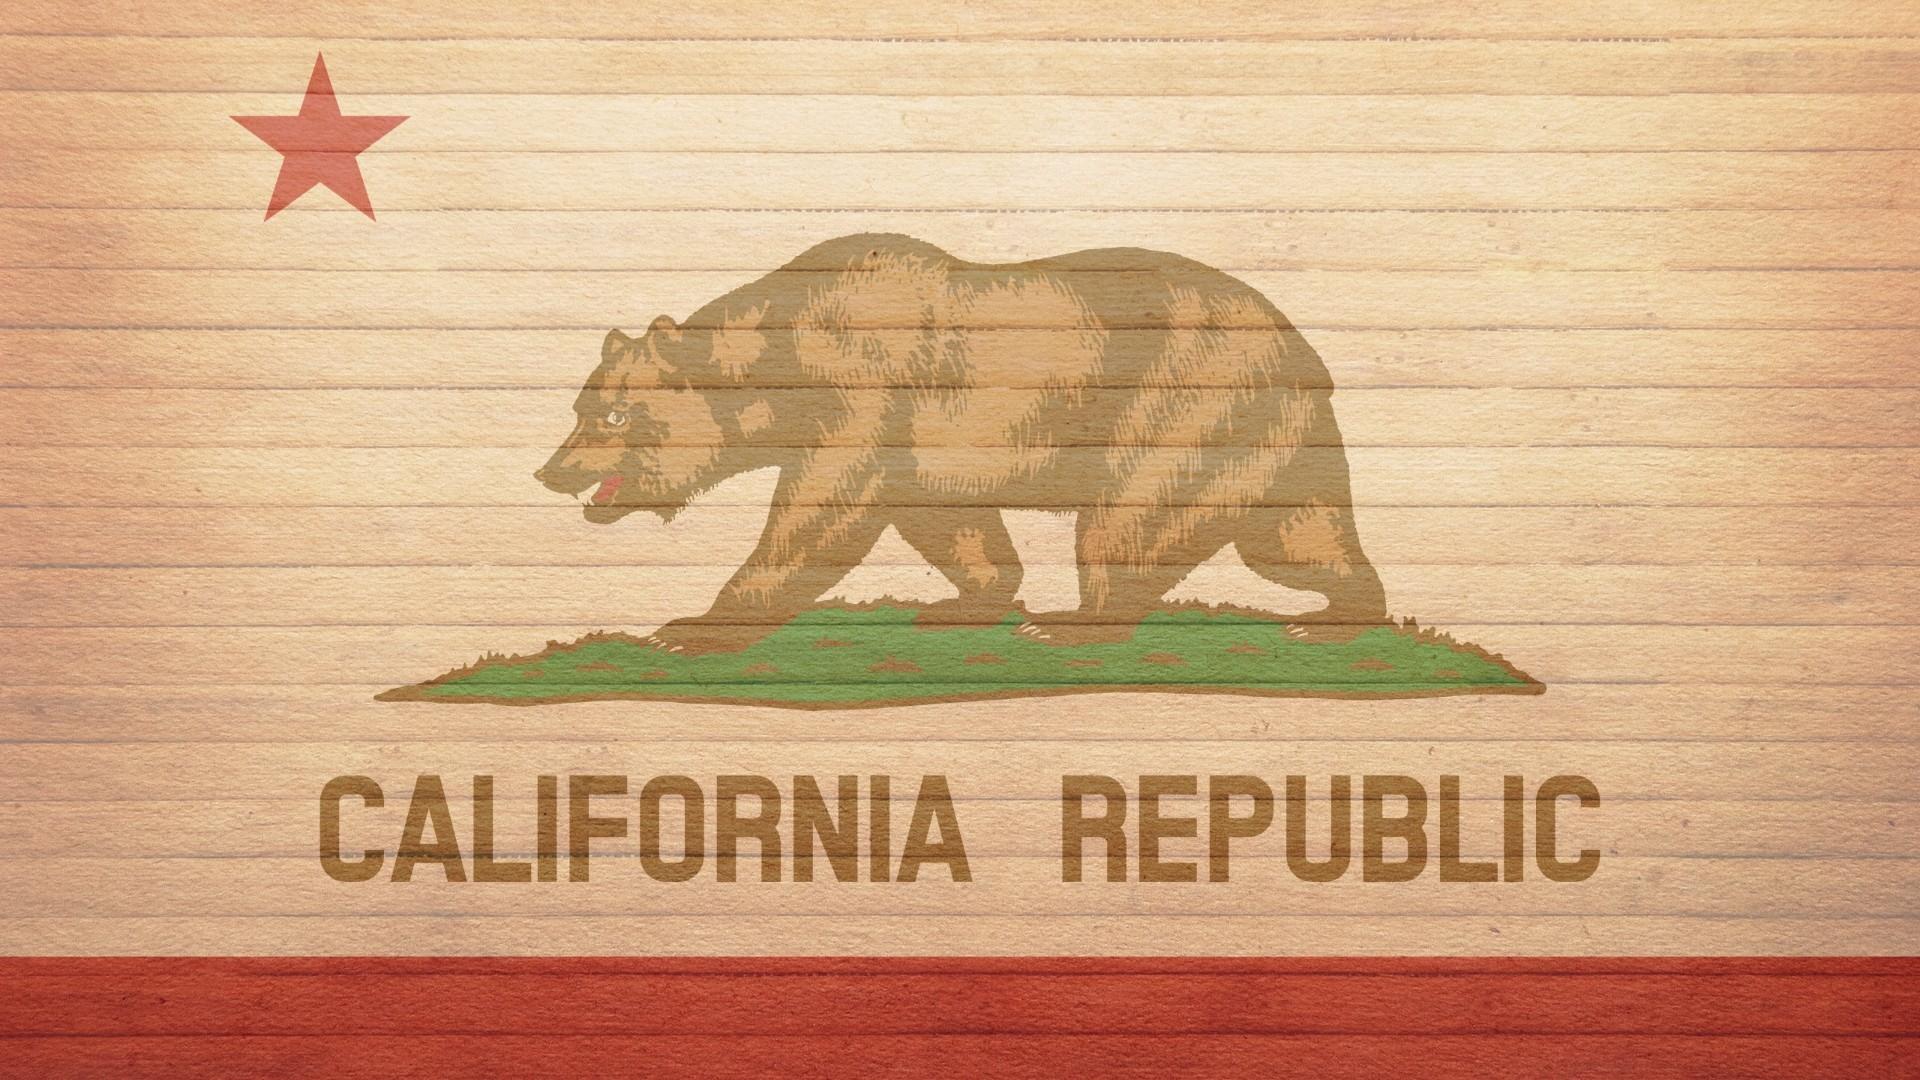 … California Flag – Wallpaper [1920 x 1080] by uda4754